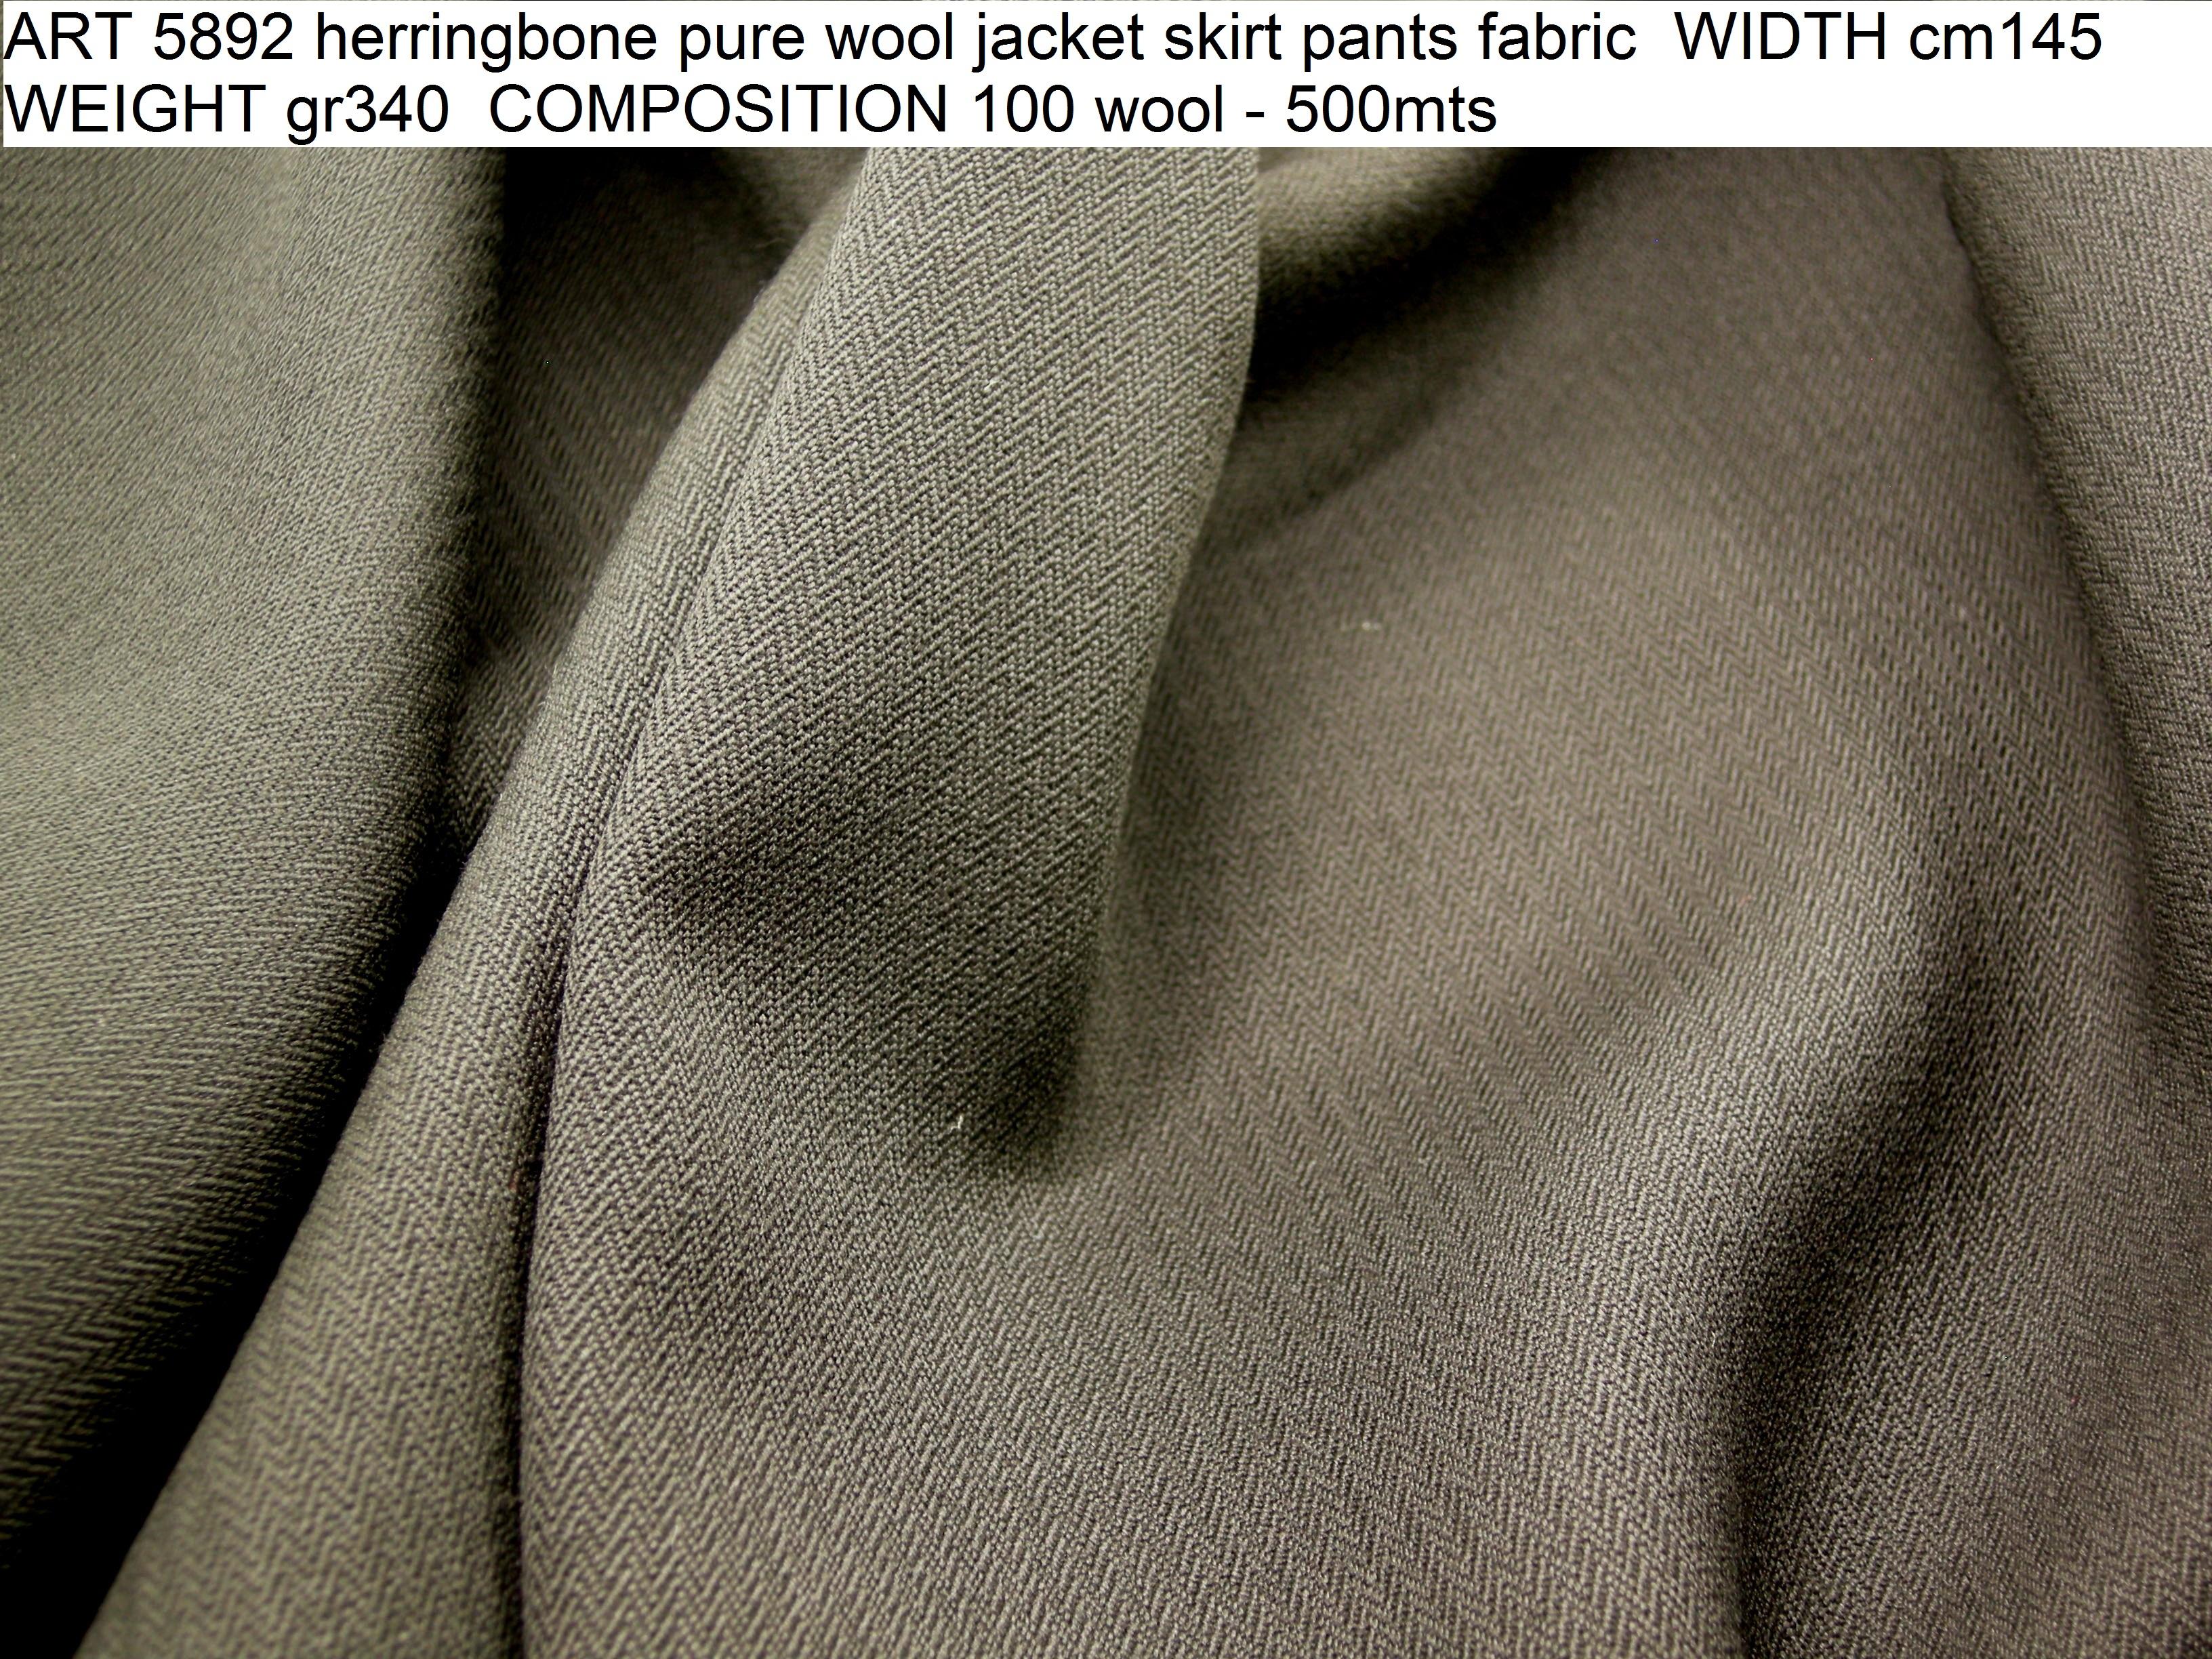 ART 5892 herringbone pure wool jacket skirt pants fabric WIDTH cm145 WEIGHT gr340 COMPOSITION 100 wool - 500mts